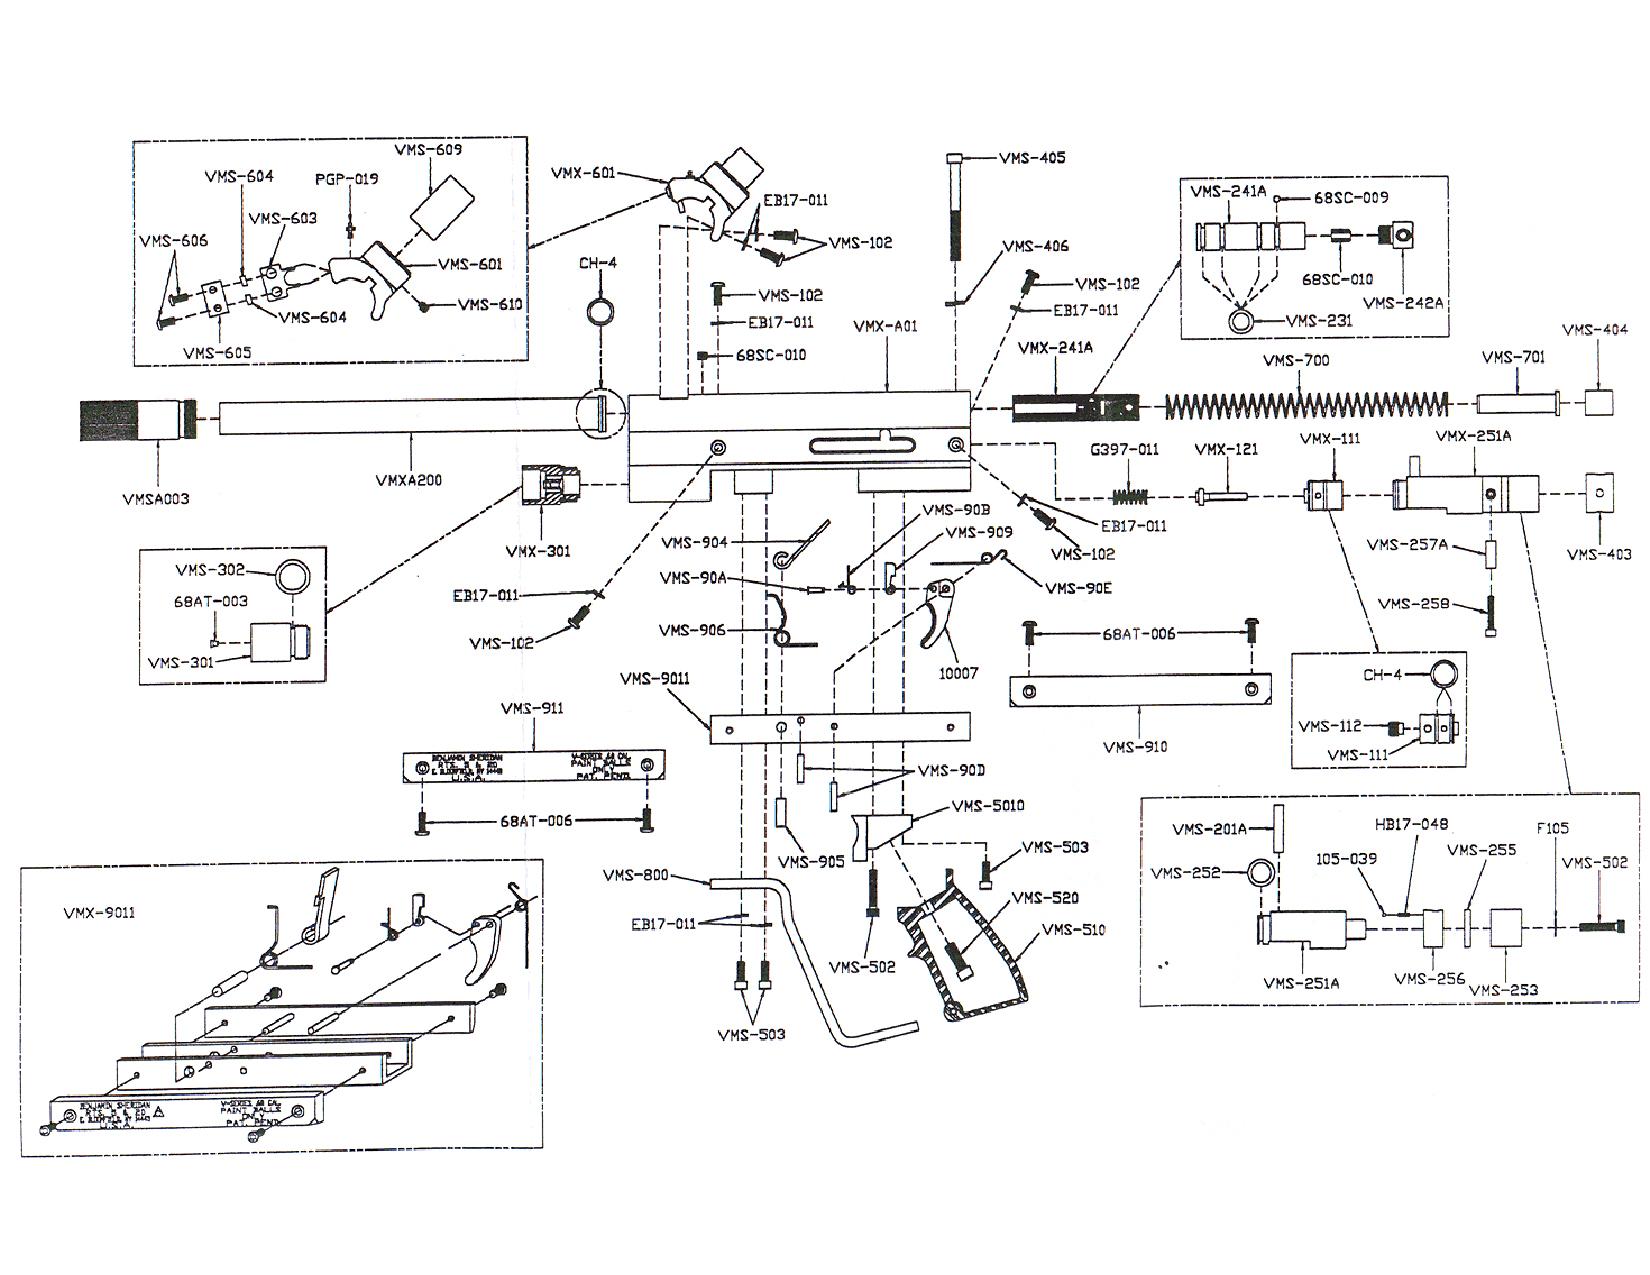 Pressure Regulator Schematic Paintball Circuit Connection Diagram